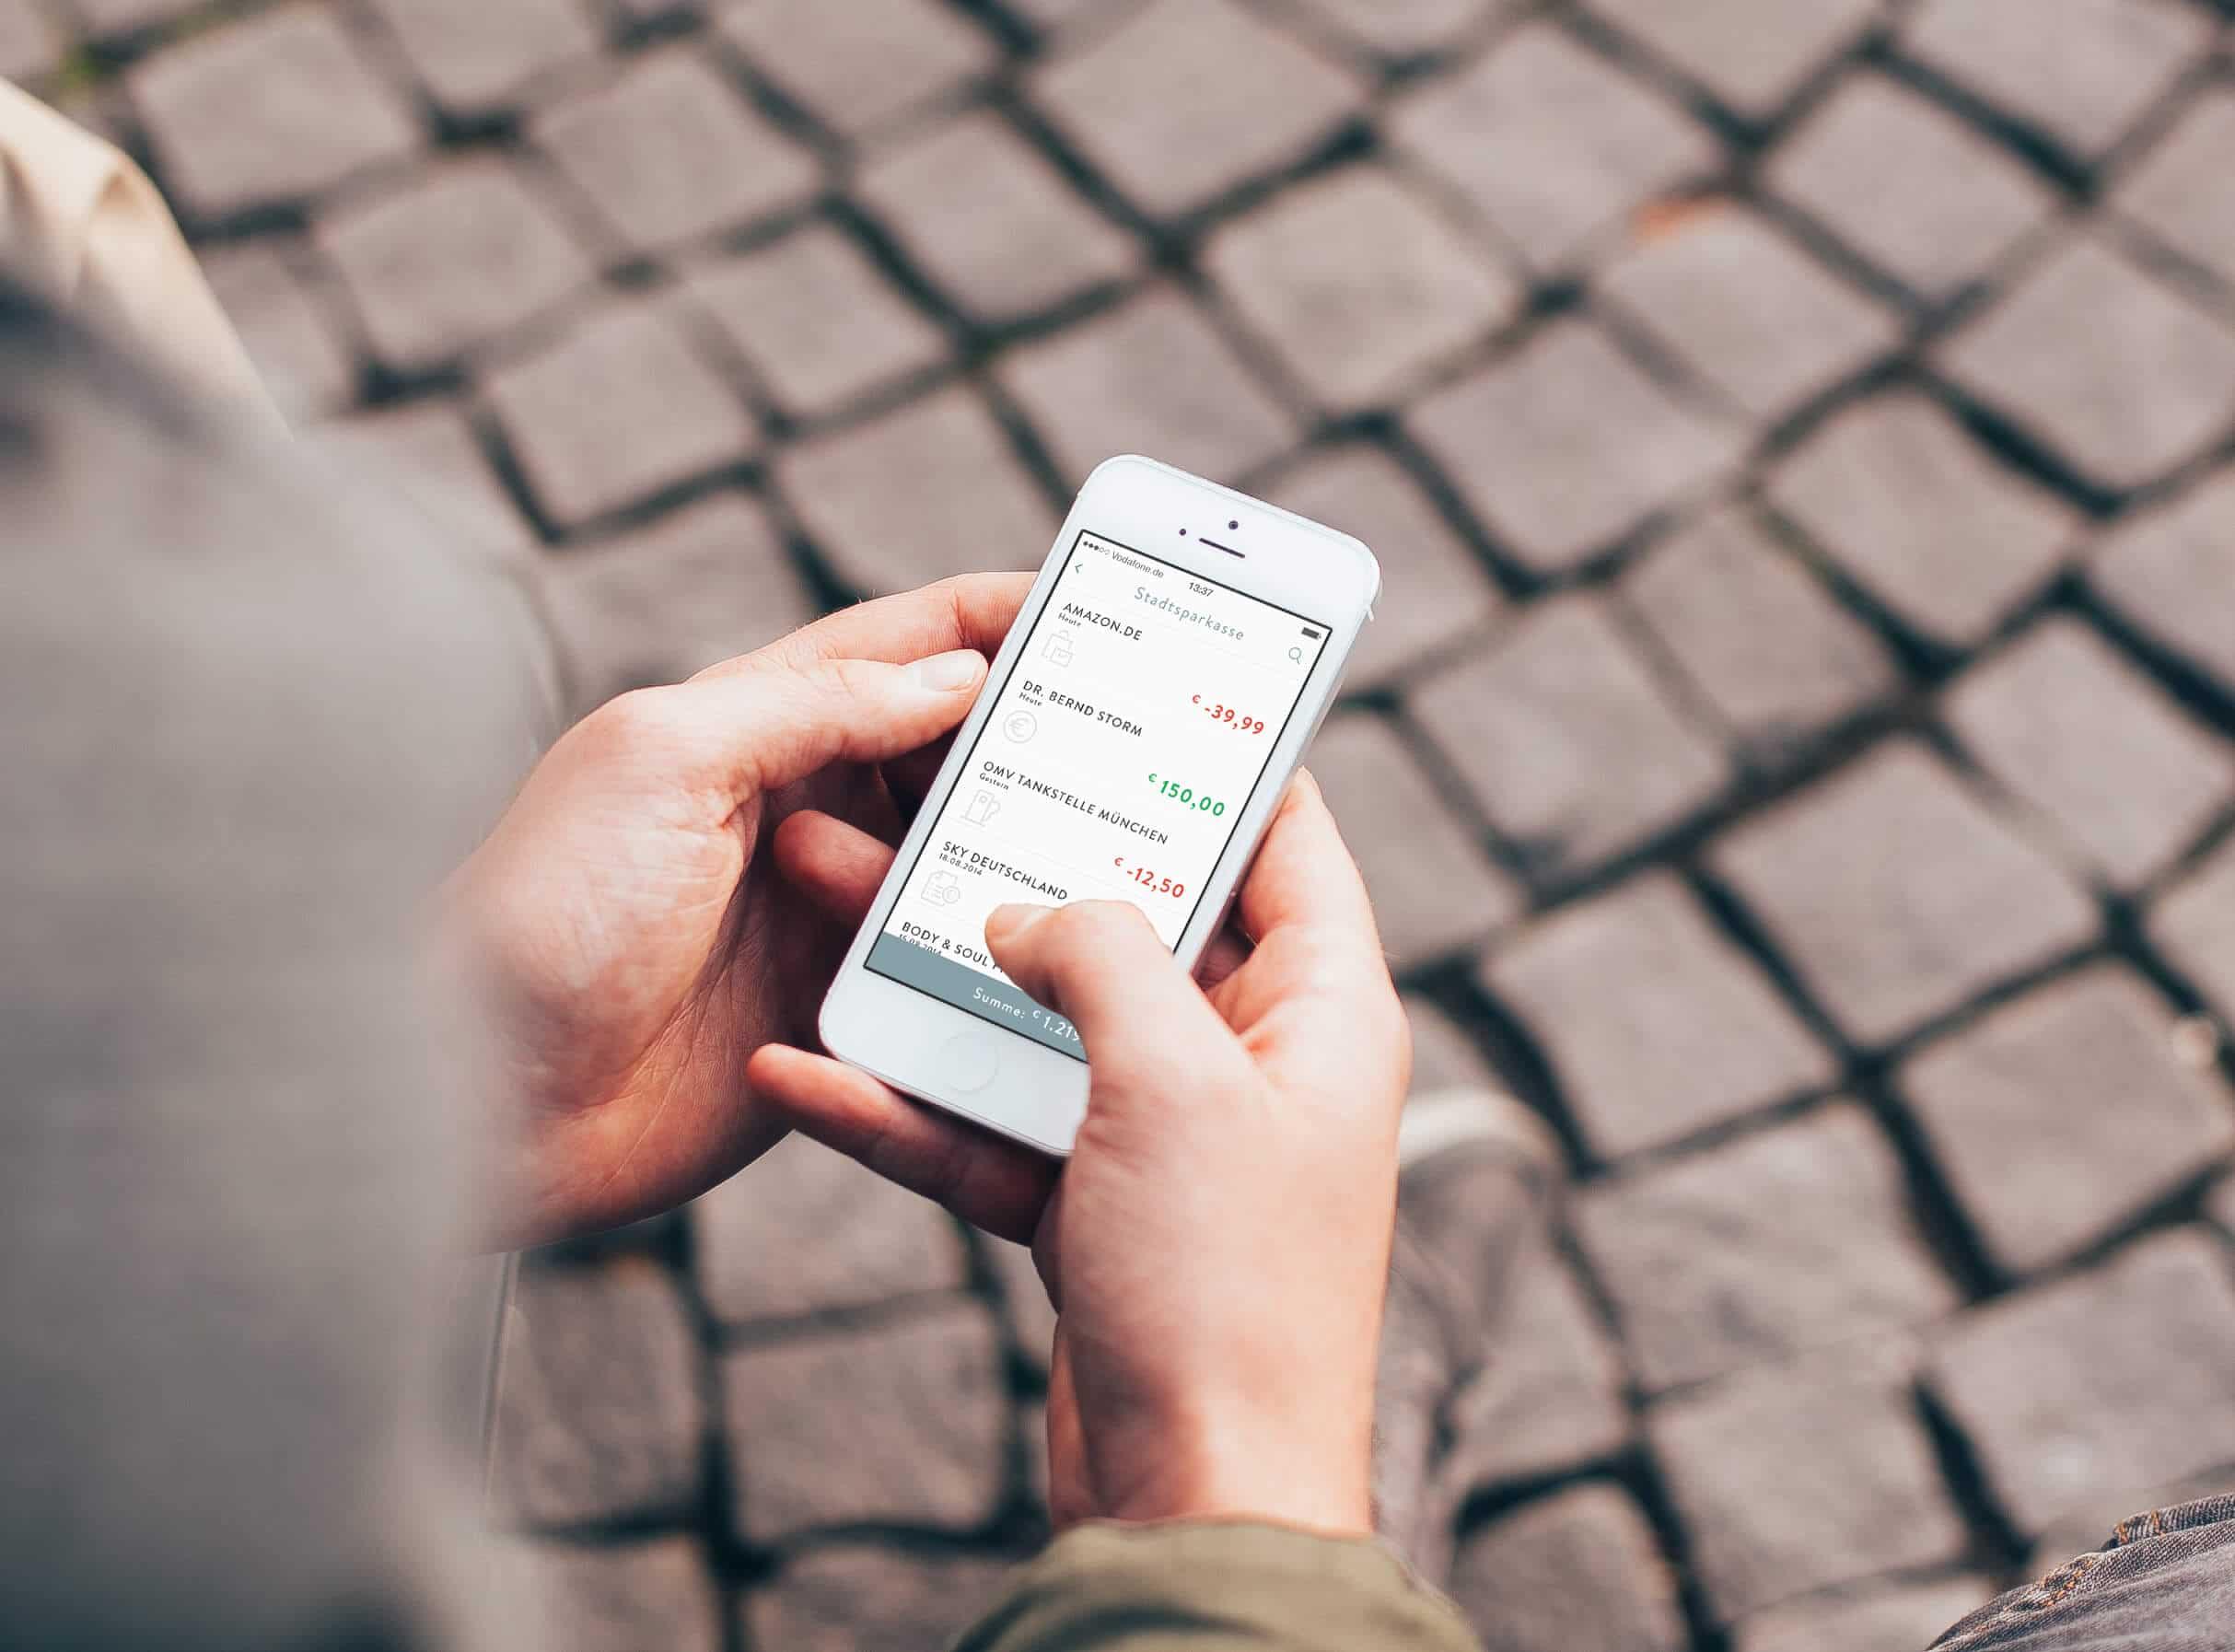 stiftung warentest probeabo kündigen free dating app